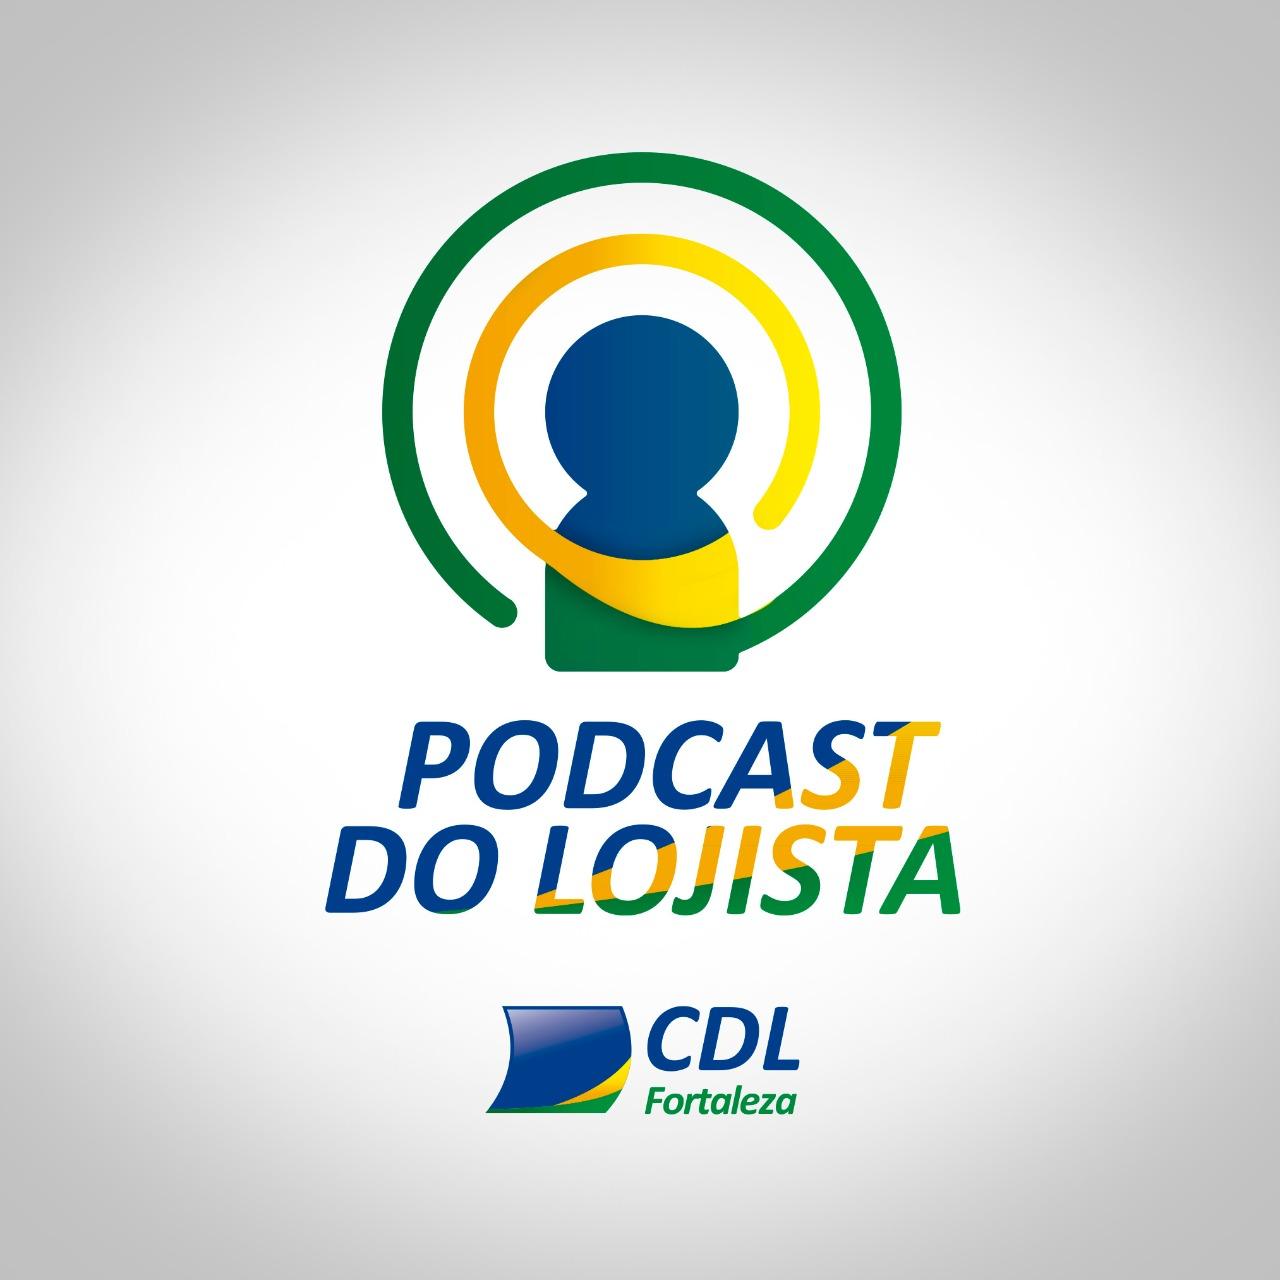 Podcast do Lojista